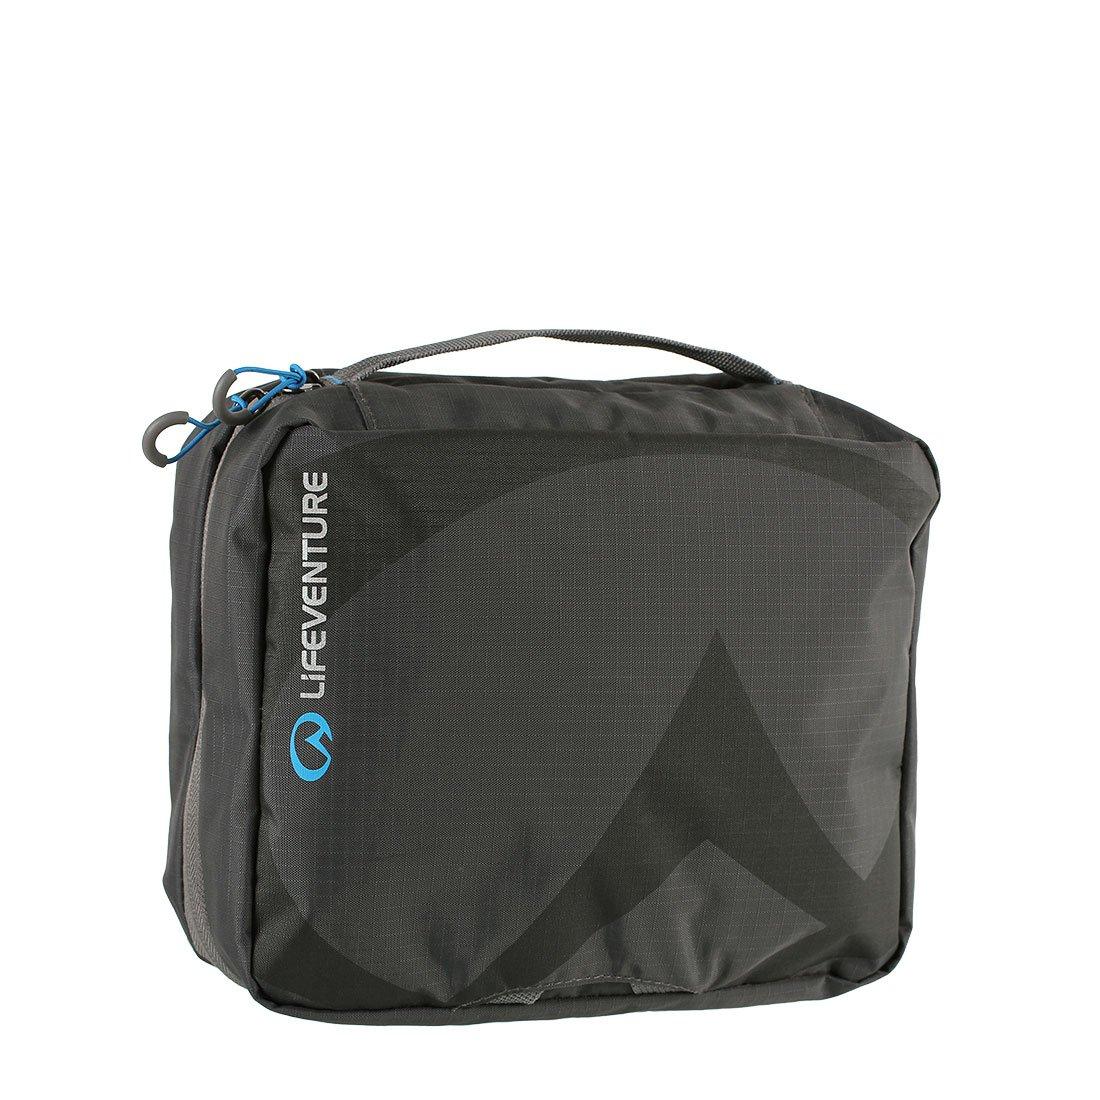 c30854fc52 Large Travel Wash Bag